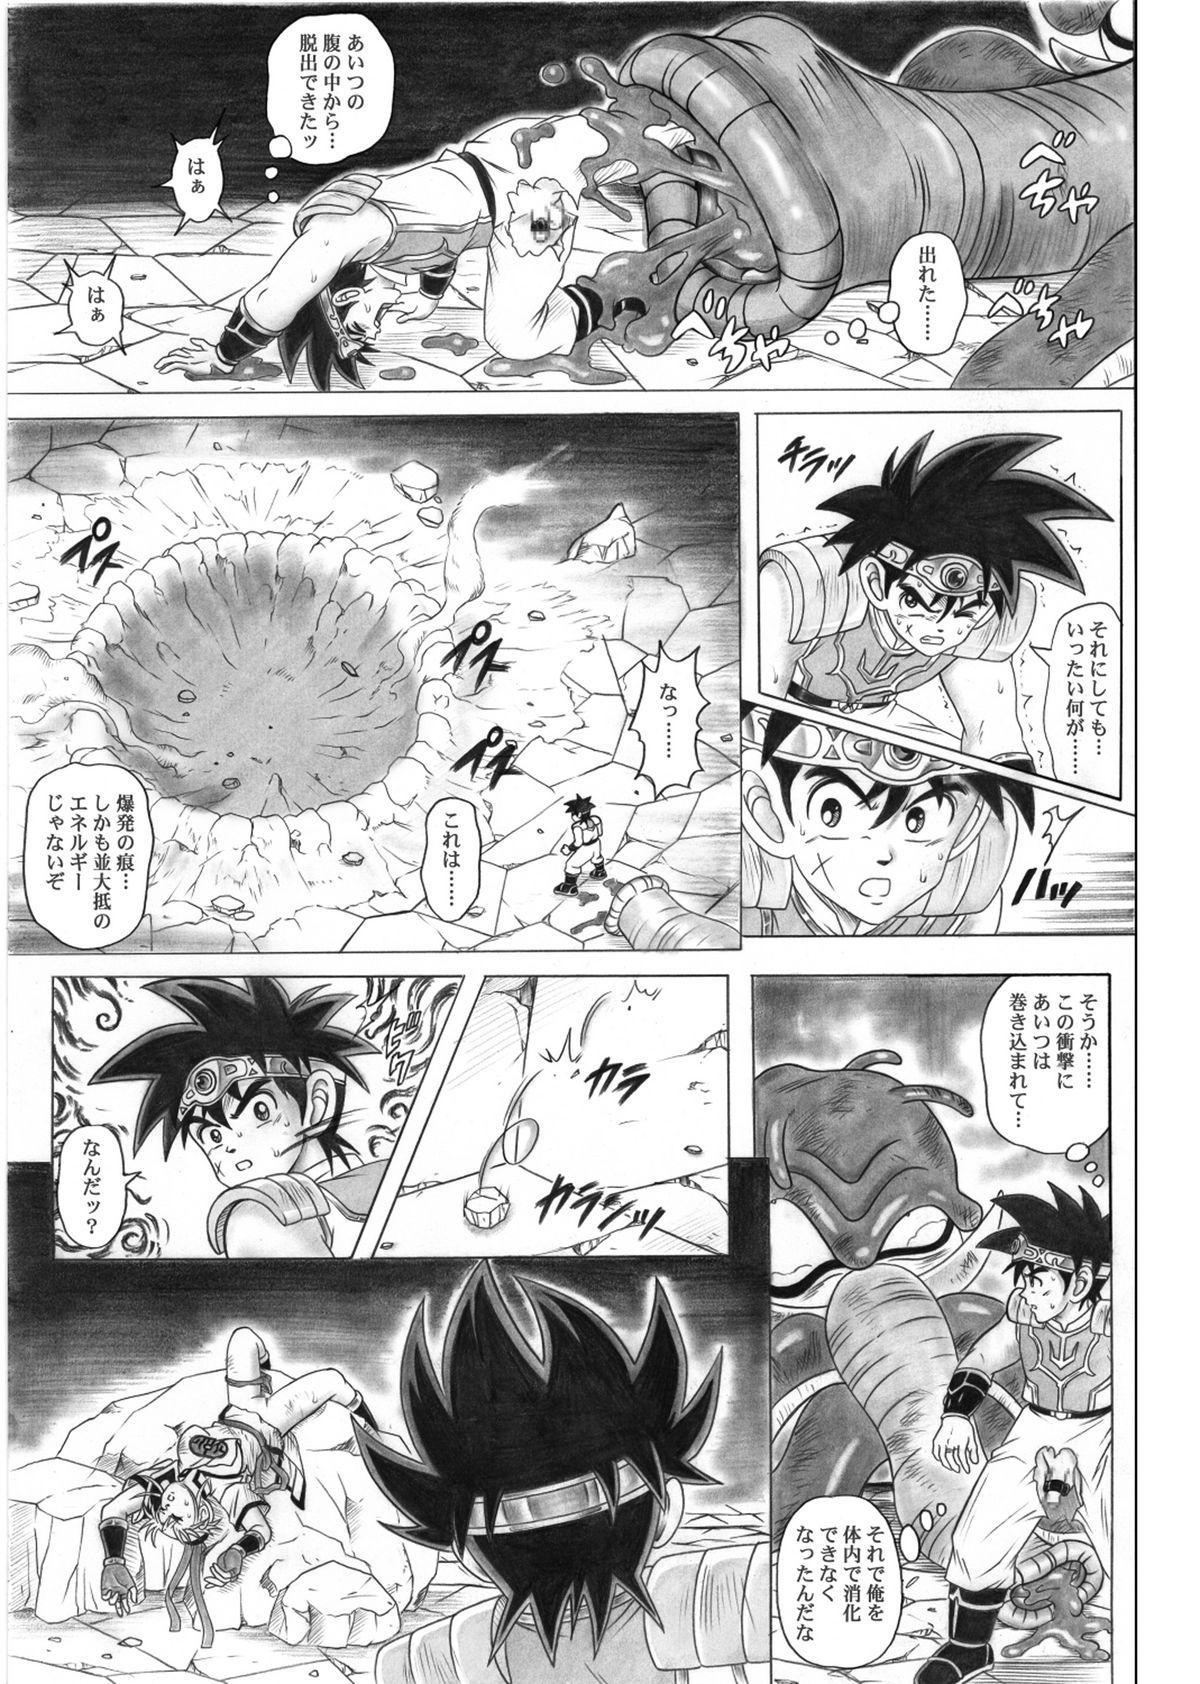 [Cyclone (Reizei, Izumi)] STAR TAC IDO ~Youkuso Haja no Doukutsu he~ Chuuhen Download edition (Dragon Warrior: Dai's Great Adventure) [Digital] 16